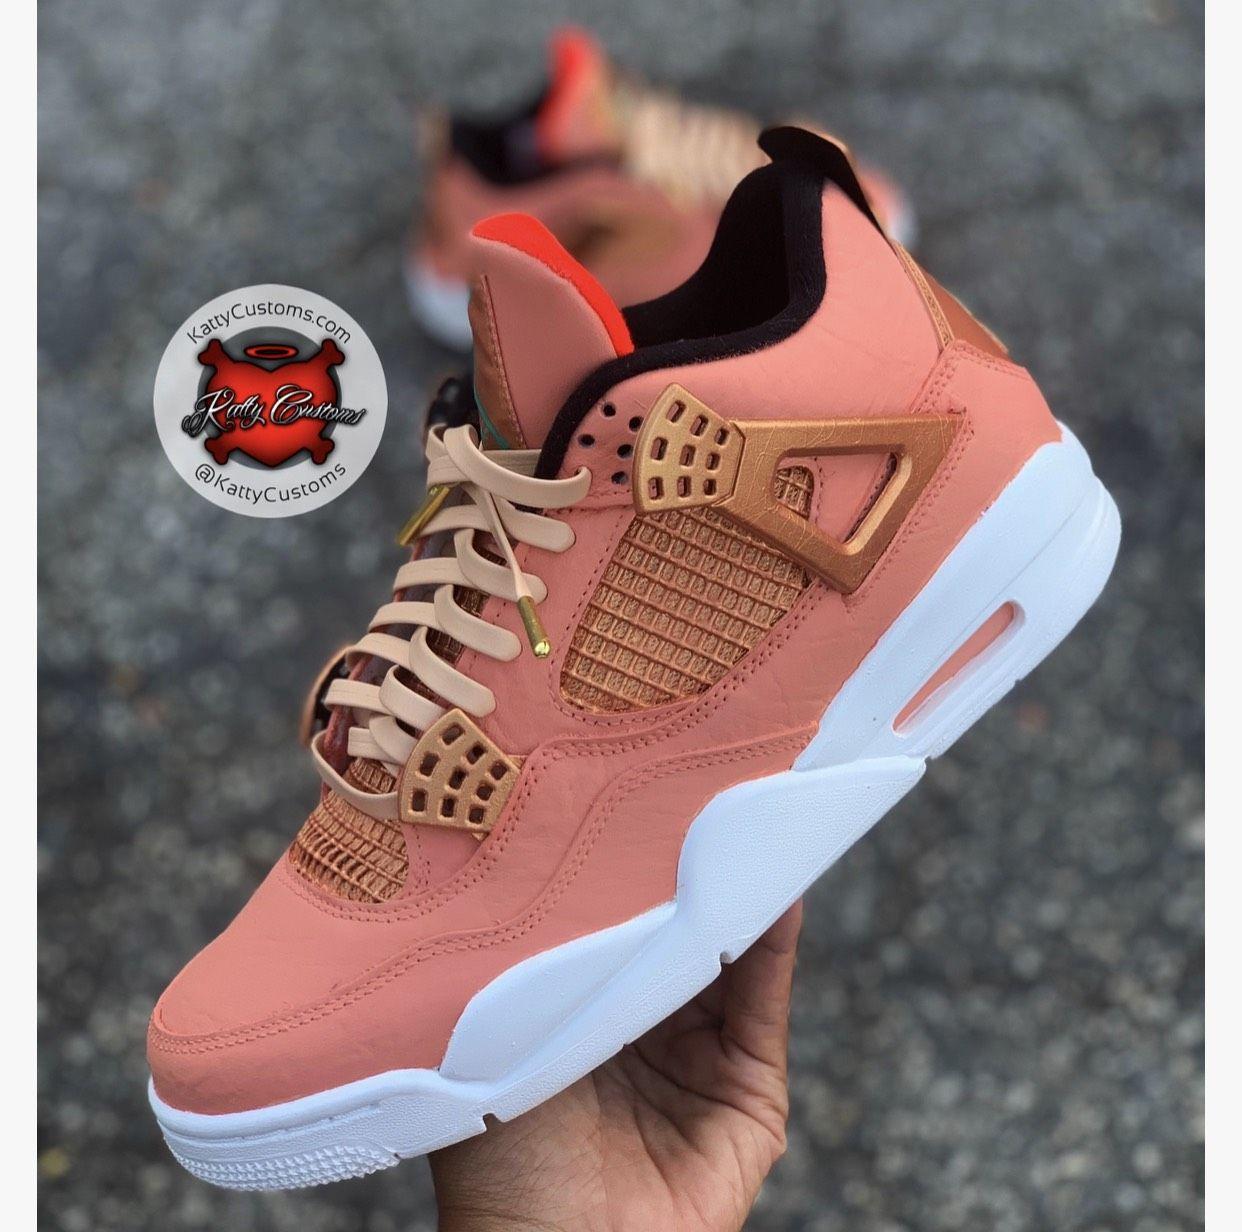 Jordan shoes retro, Nike air shoes